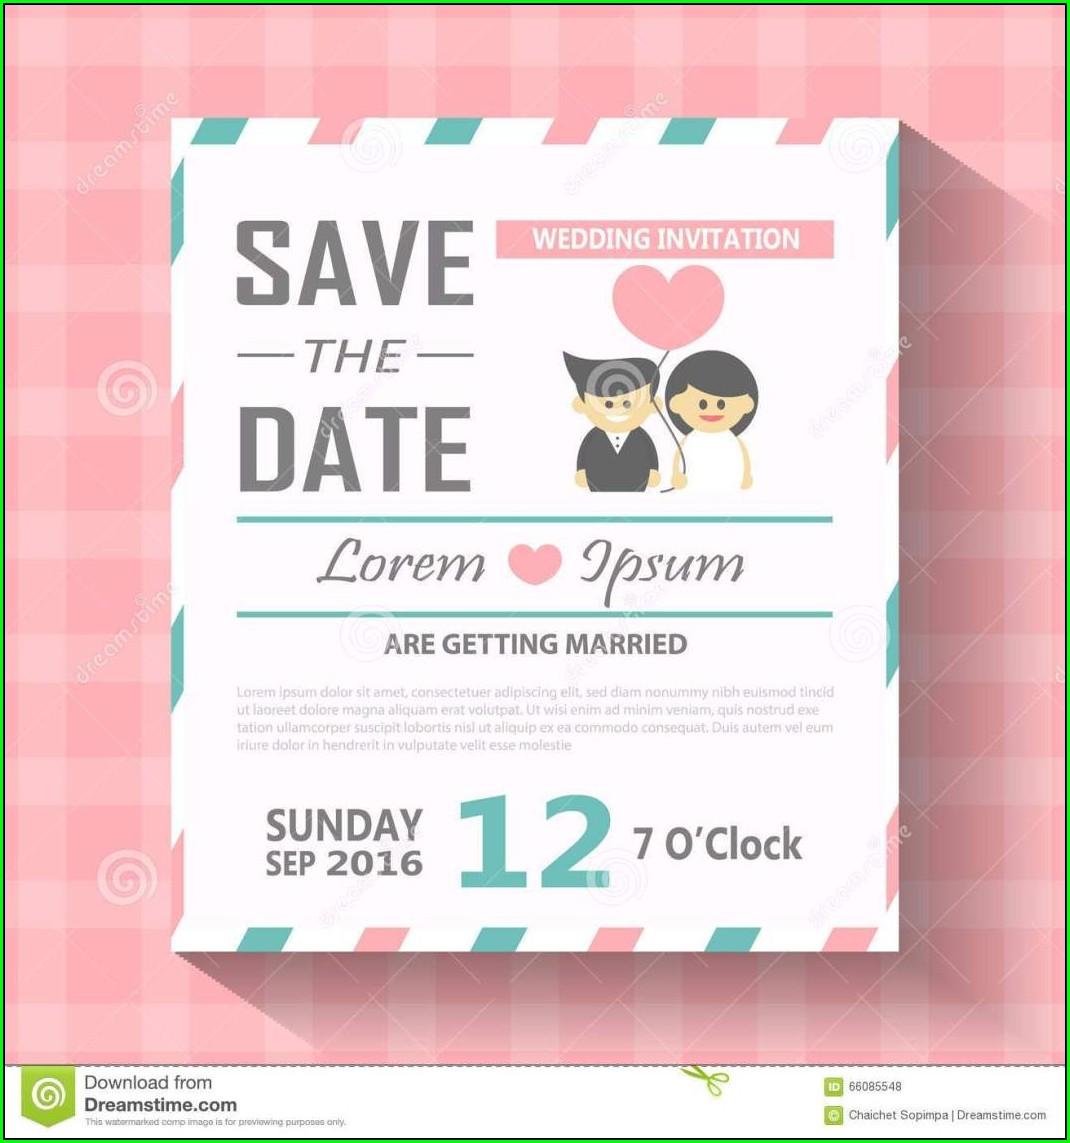 Editable Invitation Card Template Free Download